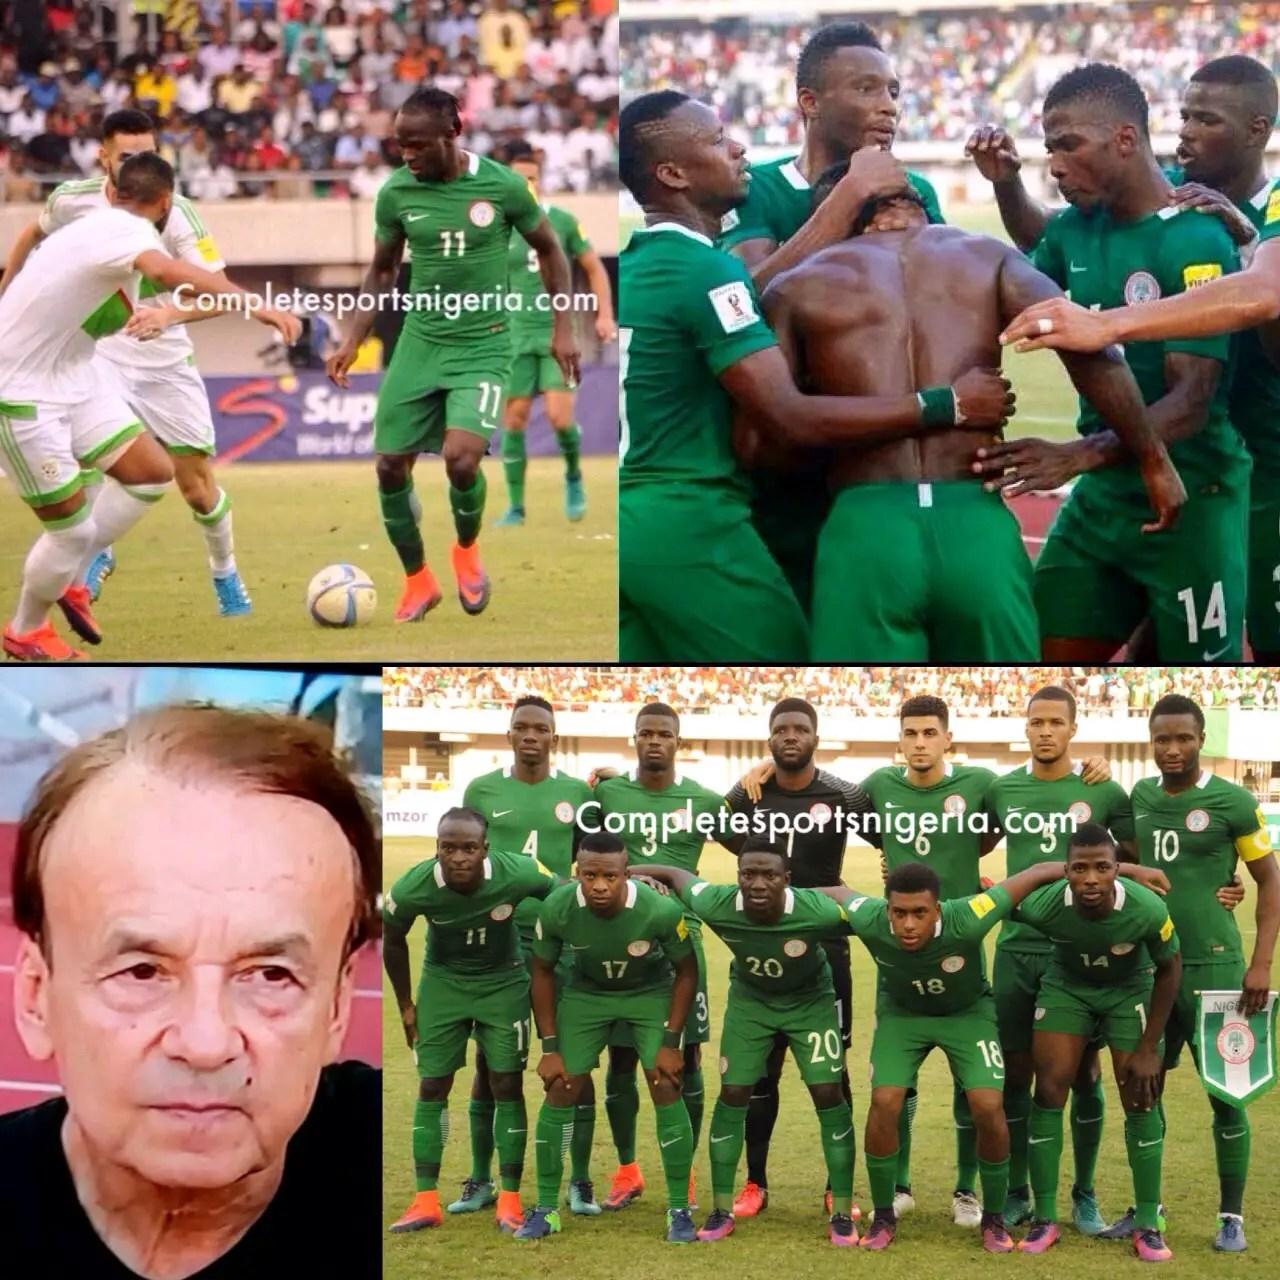 Odegbami: Nigeria – One Foot Already In Russia 2018!